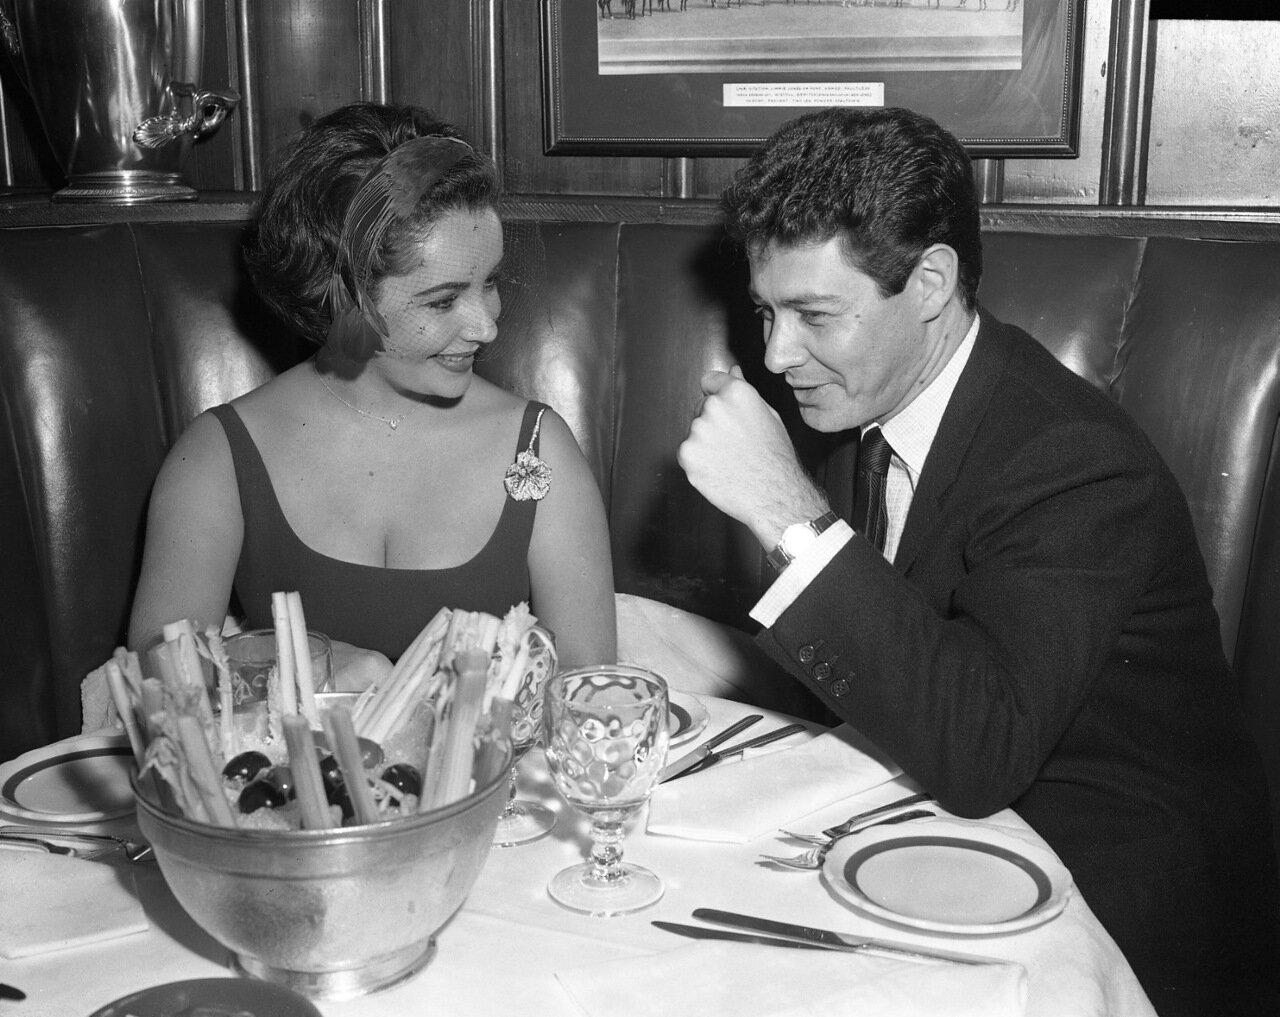 1950. Эдди Фишер (папаша принцессы Леи) с Элизабет Тейлор